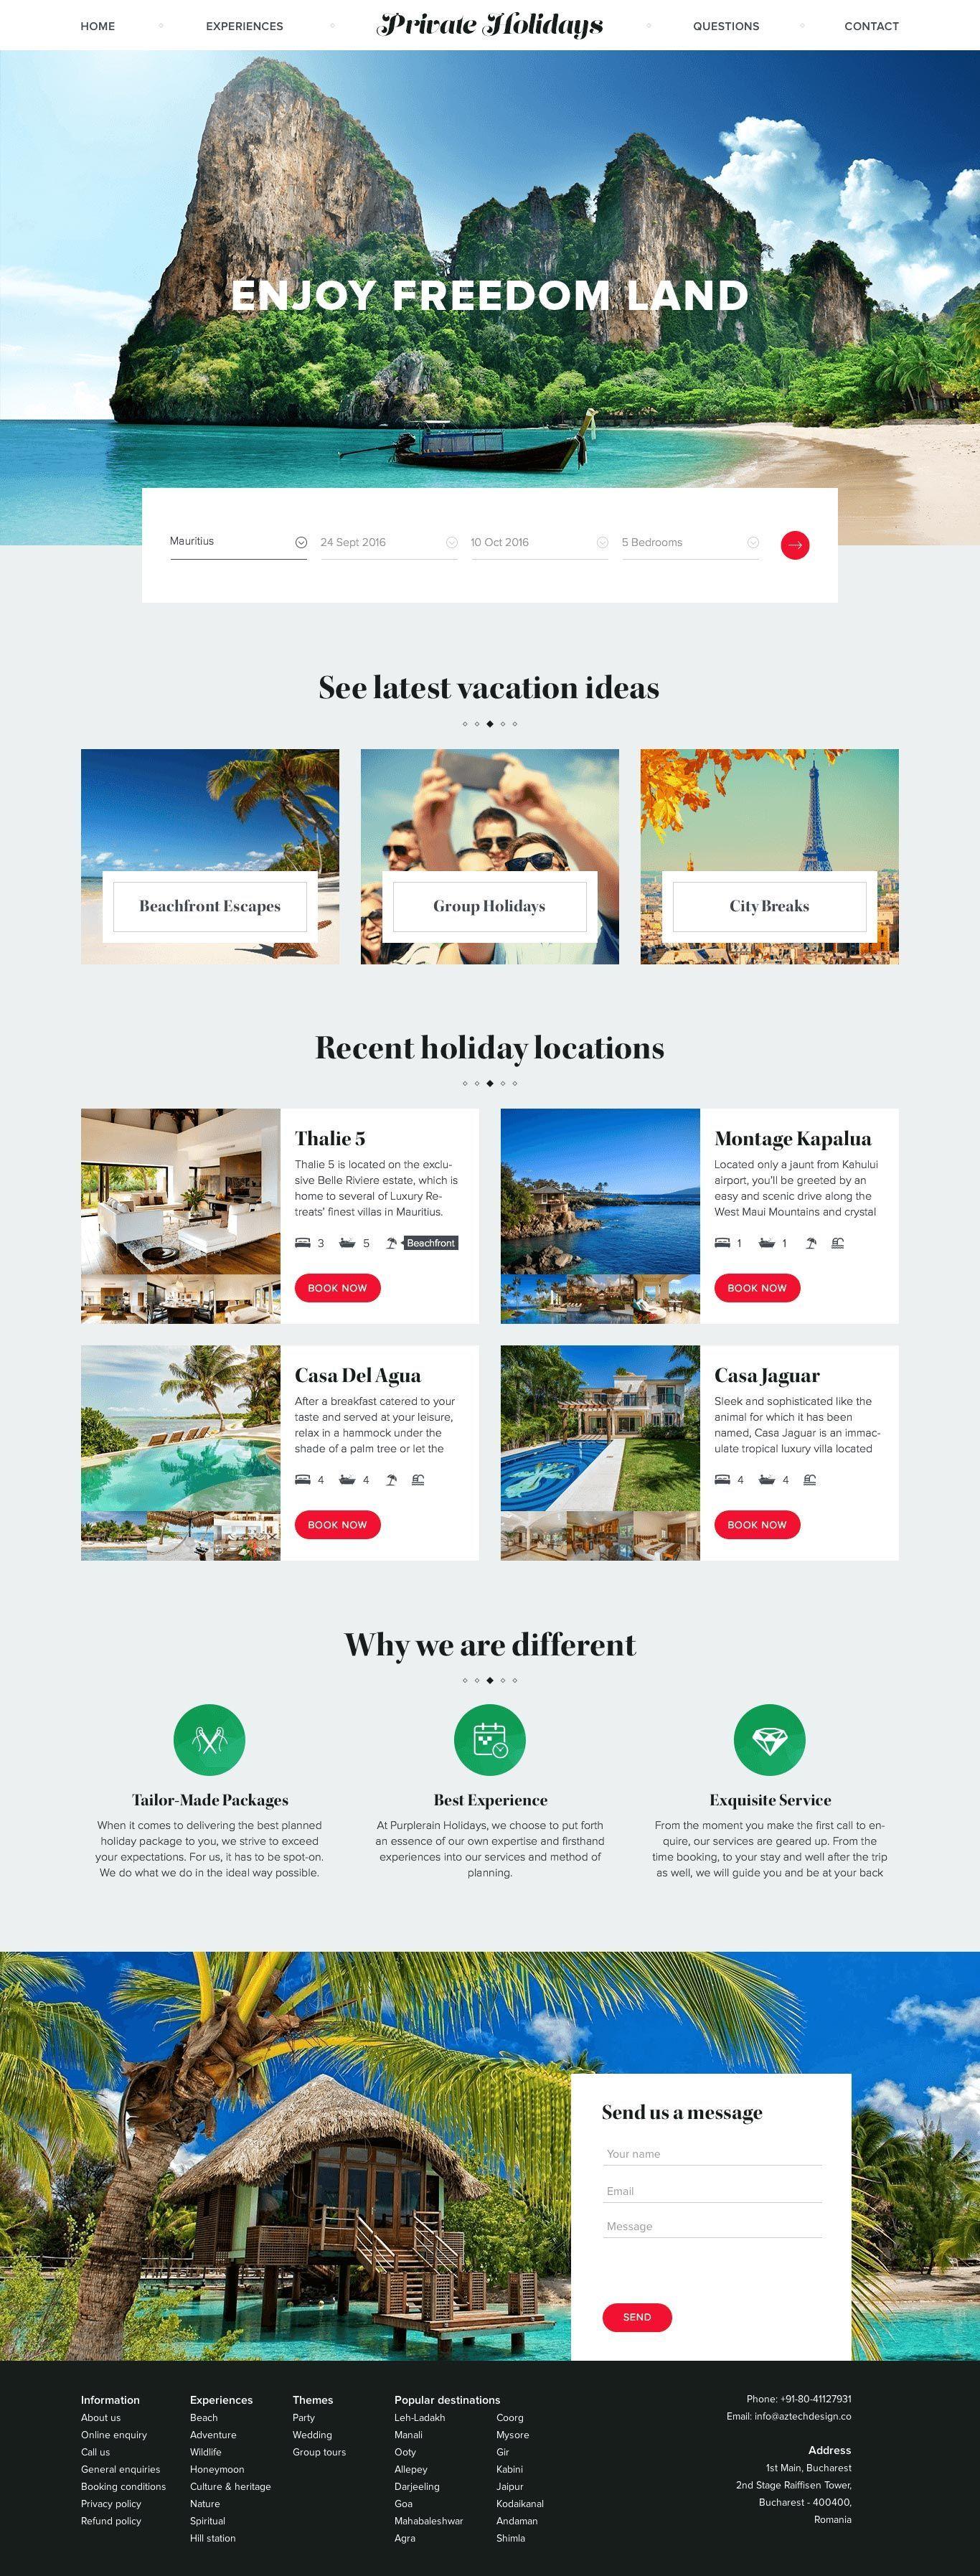 15 Amazing Travel Tourism Websites That Inspire Travel Website Design Tourism Design Tourism Website